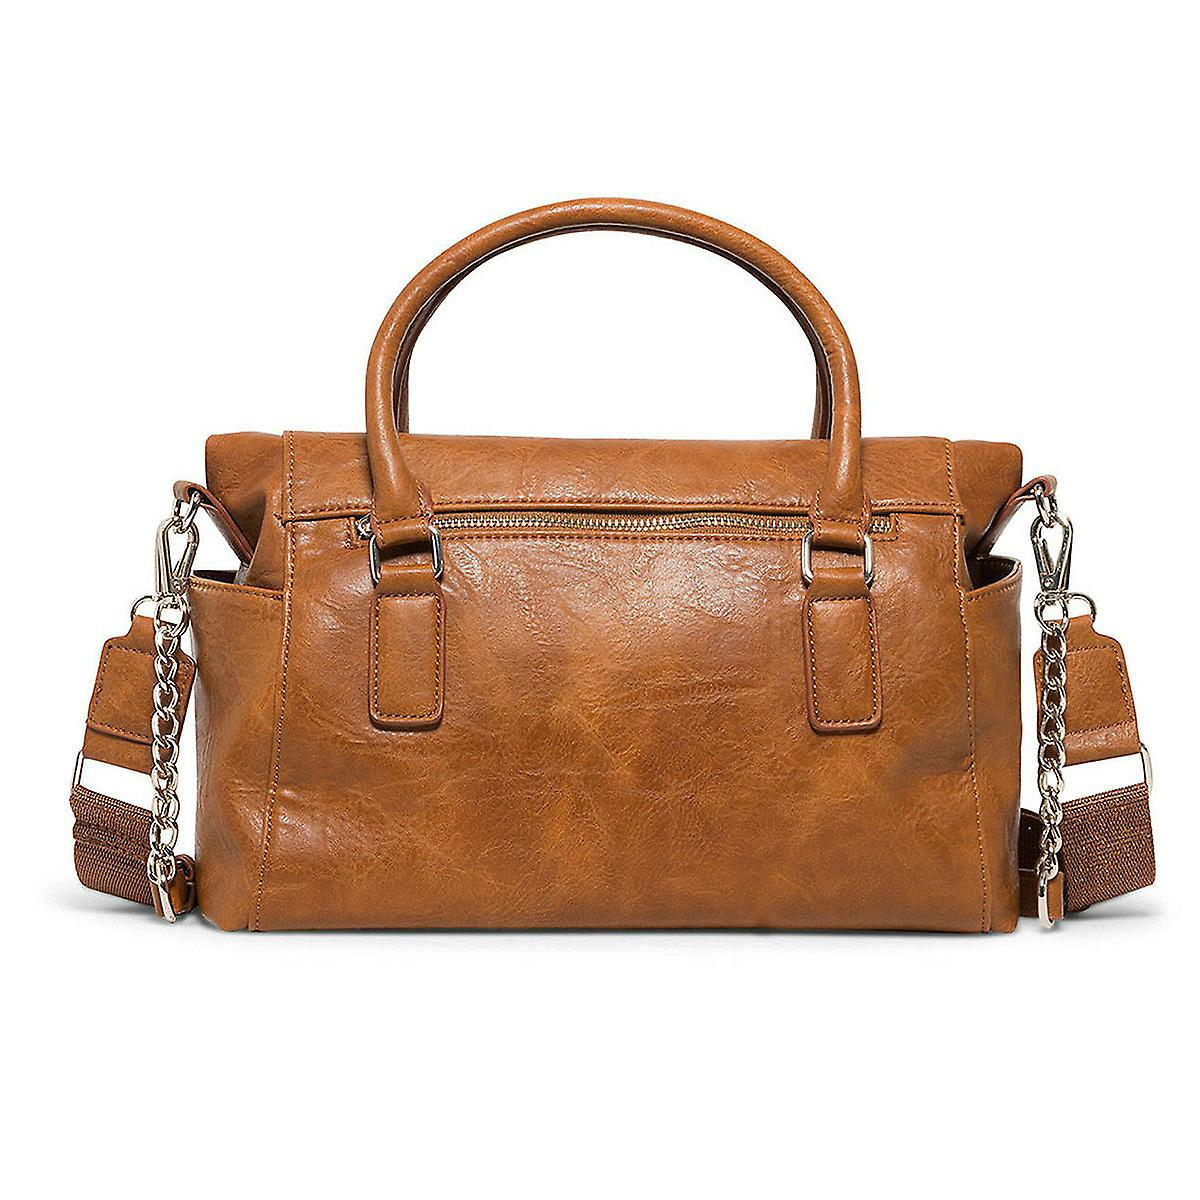 606b88066f1 18WAXPAB bag BOLs of Loverty Fruugo dark amber bag Desigual shoulder fwOvvS